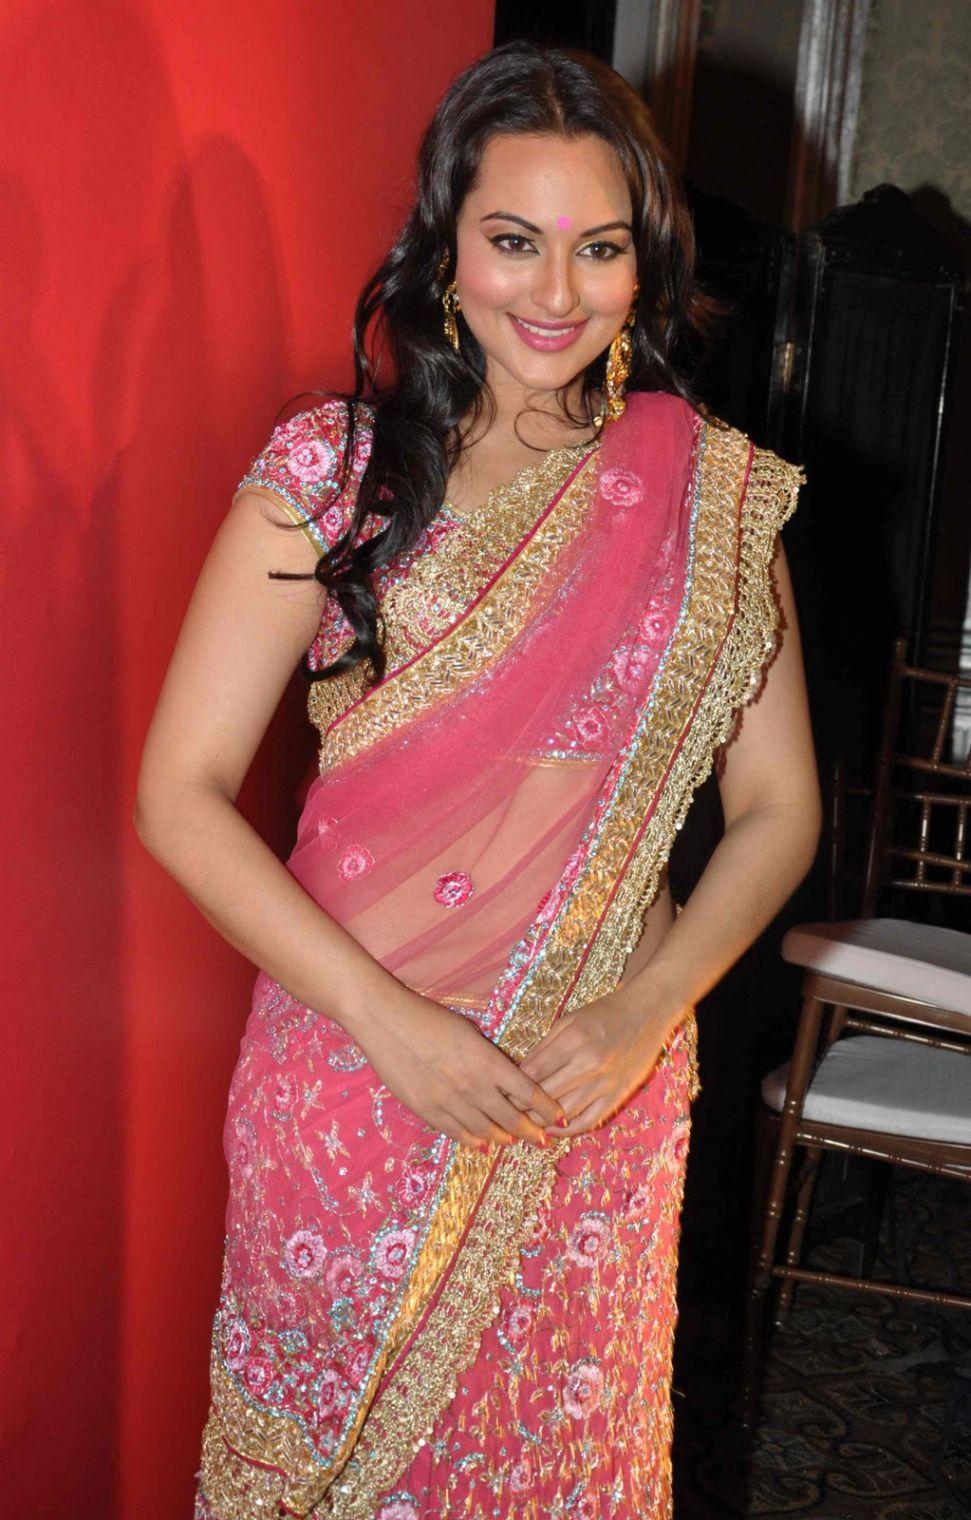 saree sinha sonakshi bollywood actress latest ramp walk pink wallpapers navel transparent celebrities photoshoot she bubbly biography rampwalk club hollywood